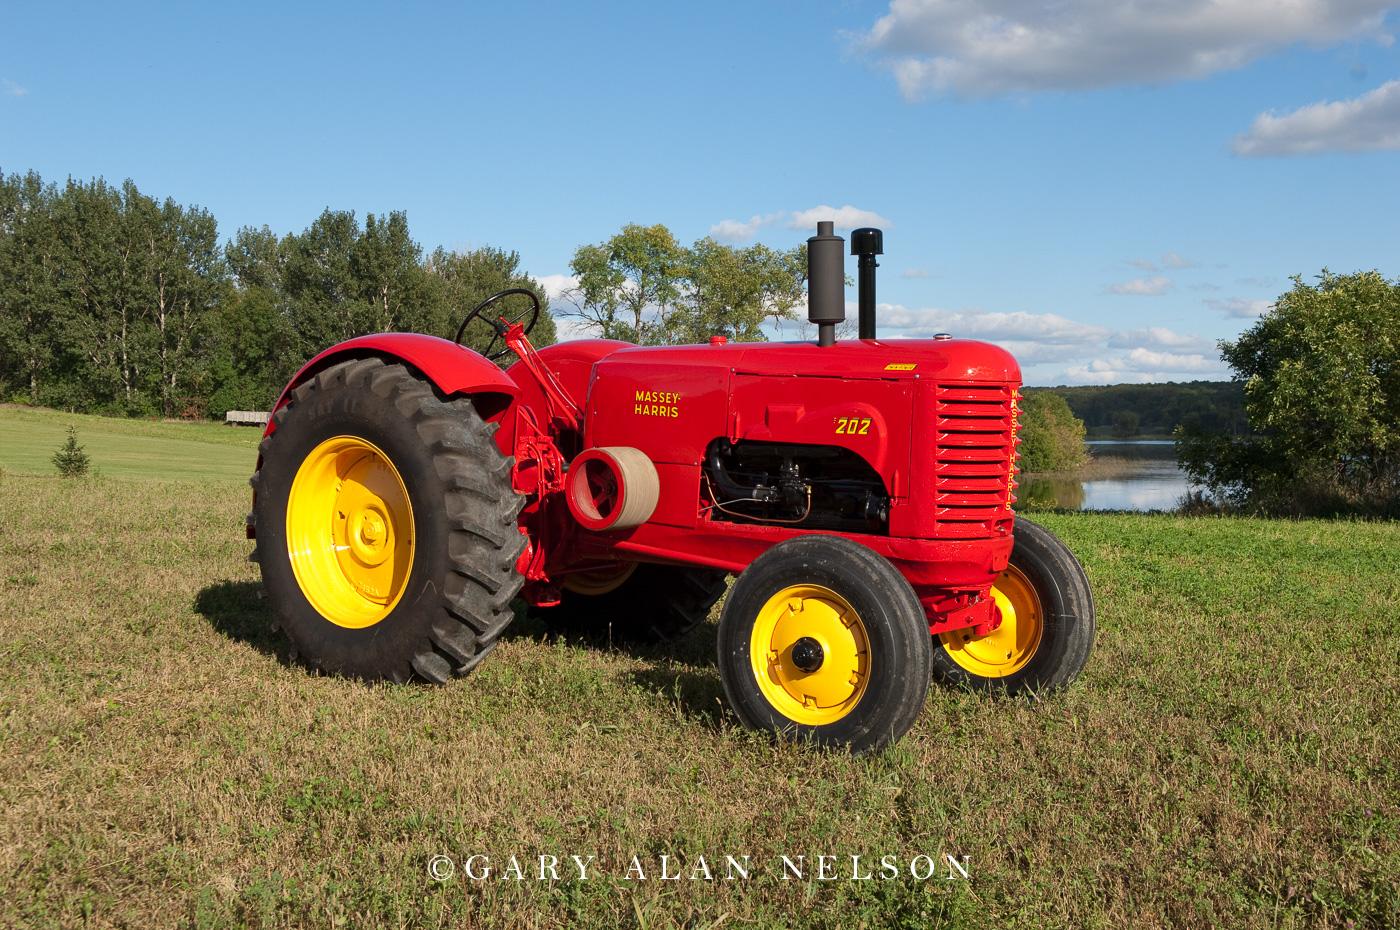 Massey-Harris, antique tractor, massey harris, tractor, photo